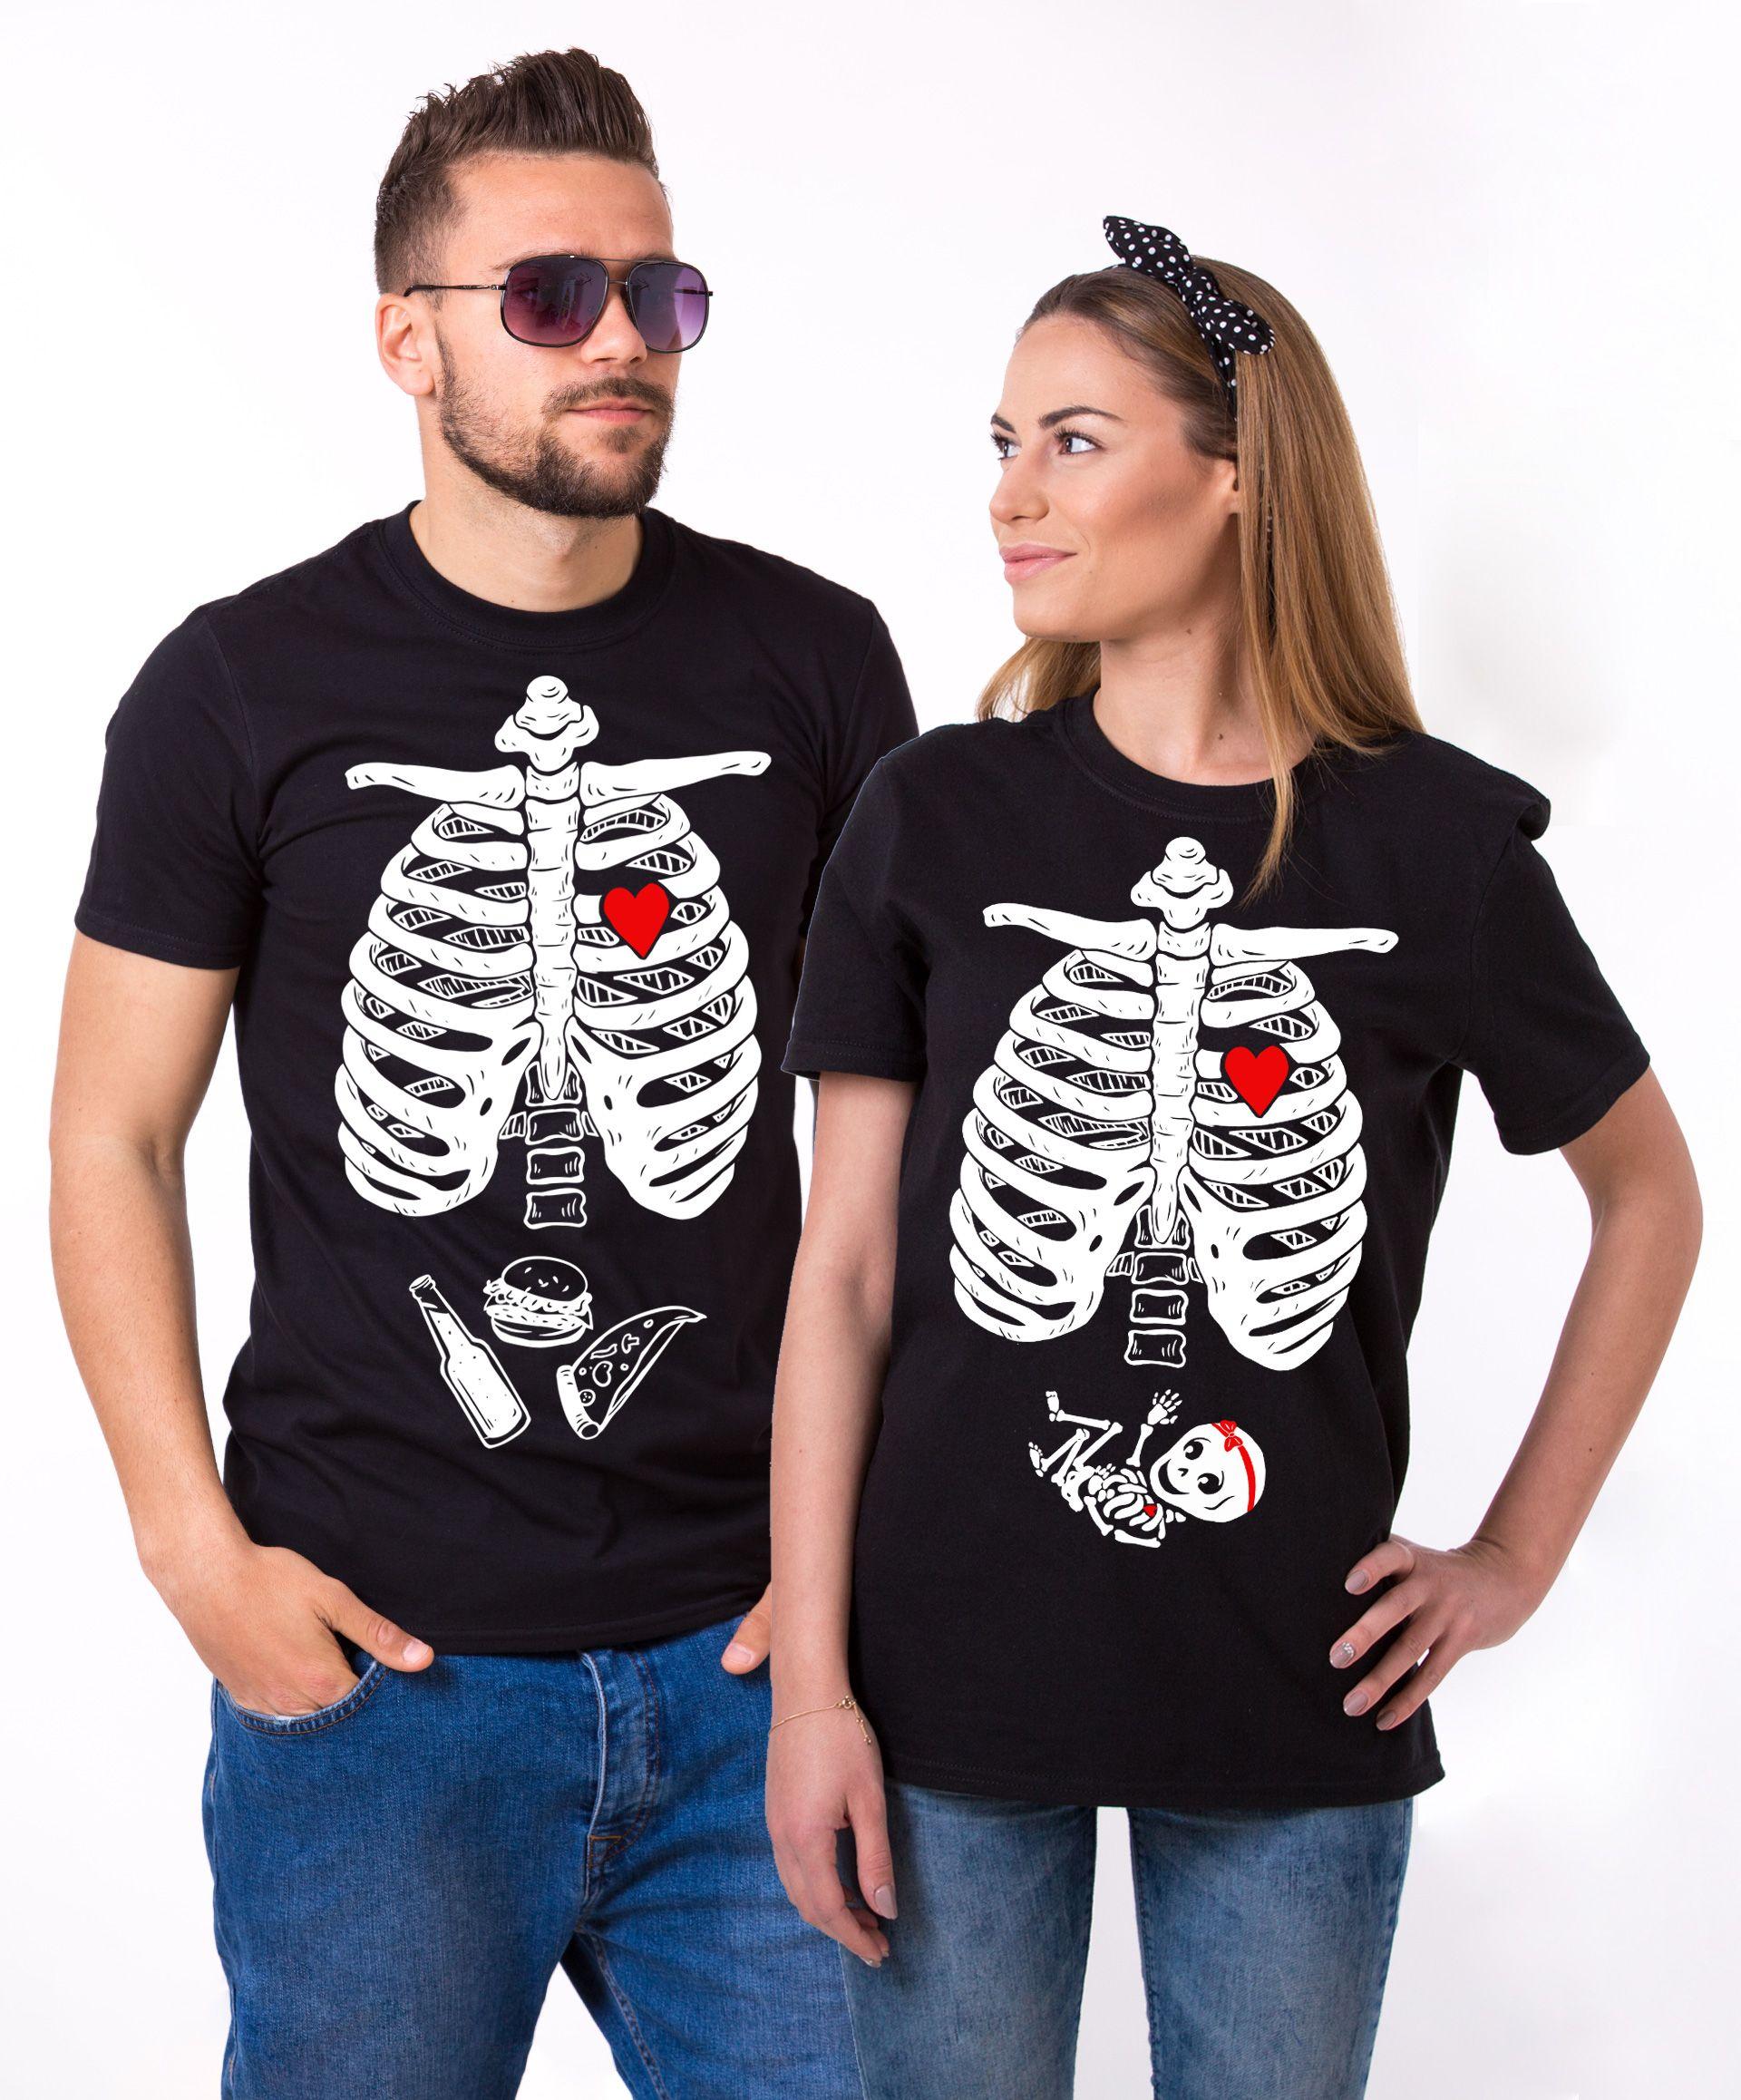 450fea7e Maternity Couple Shirts, Halloween Skeleton Shirts, Baby Girl